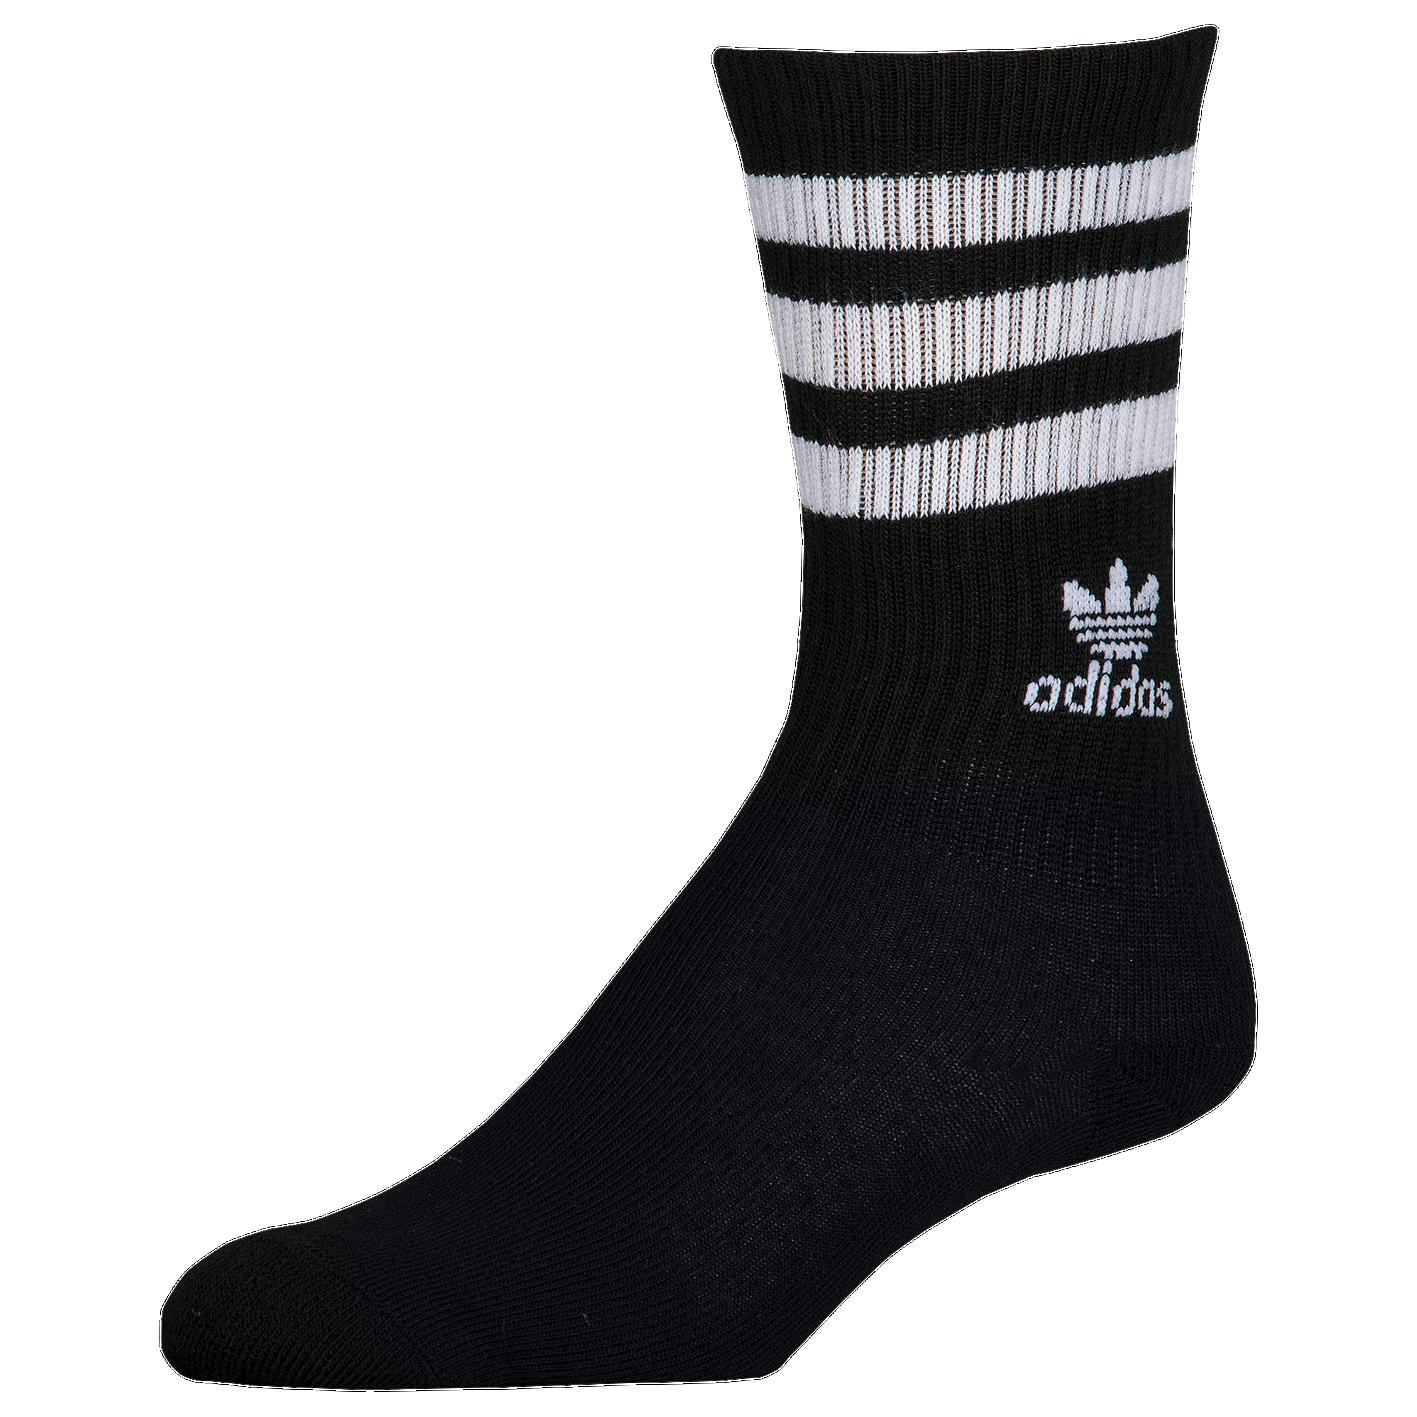 a9773bd8ab24eb adidas Originals Trefoil Roller Crew Socks - Women s - Casual ...